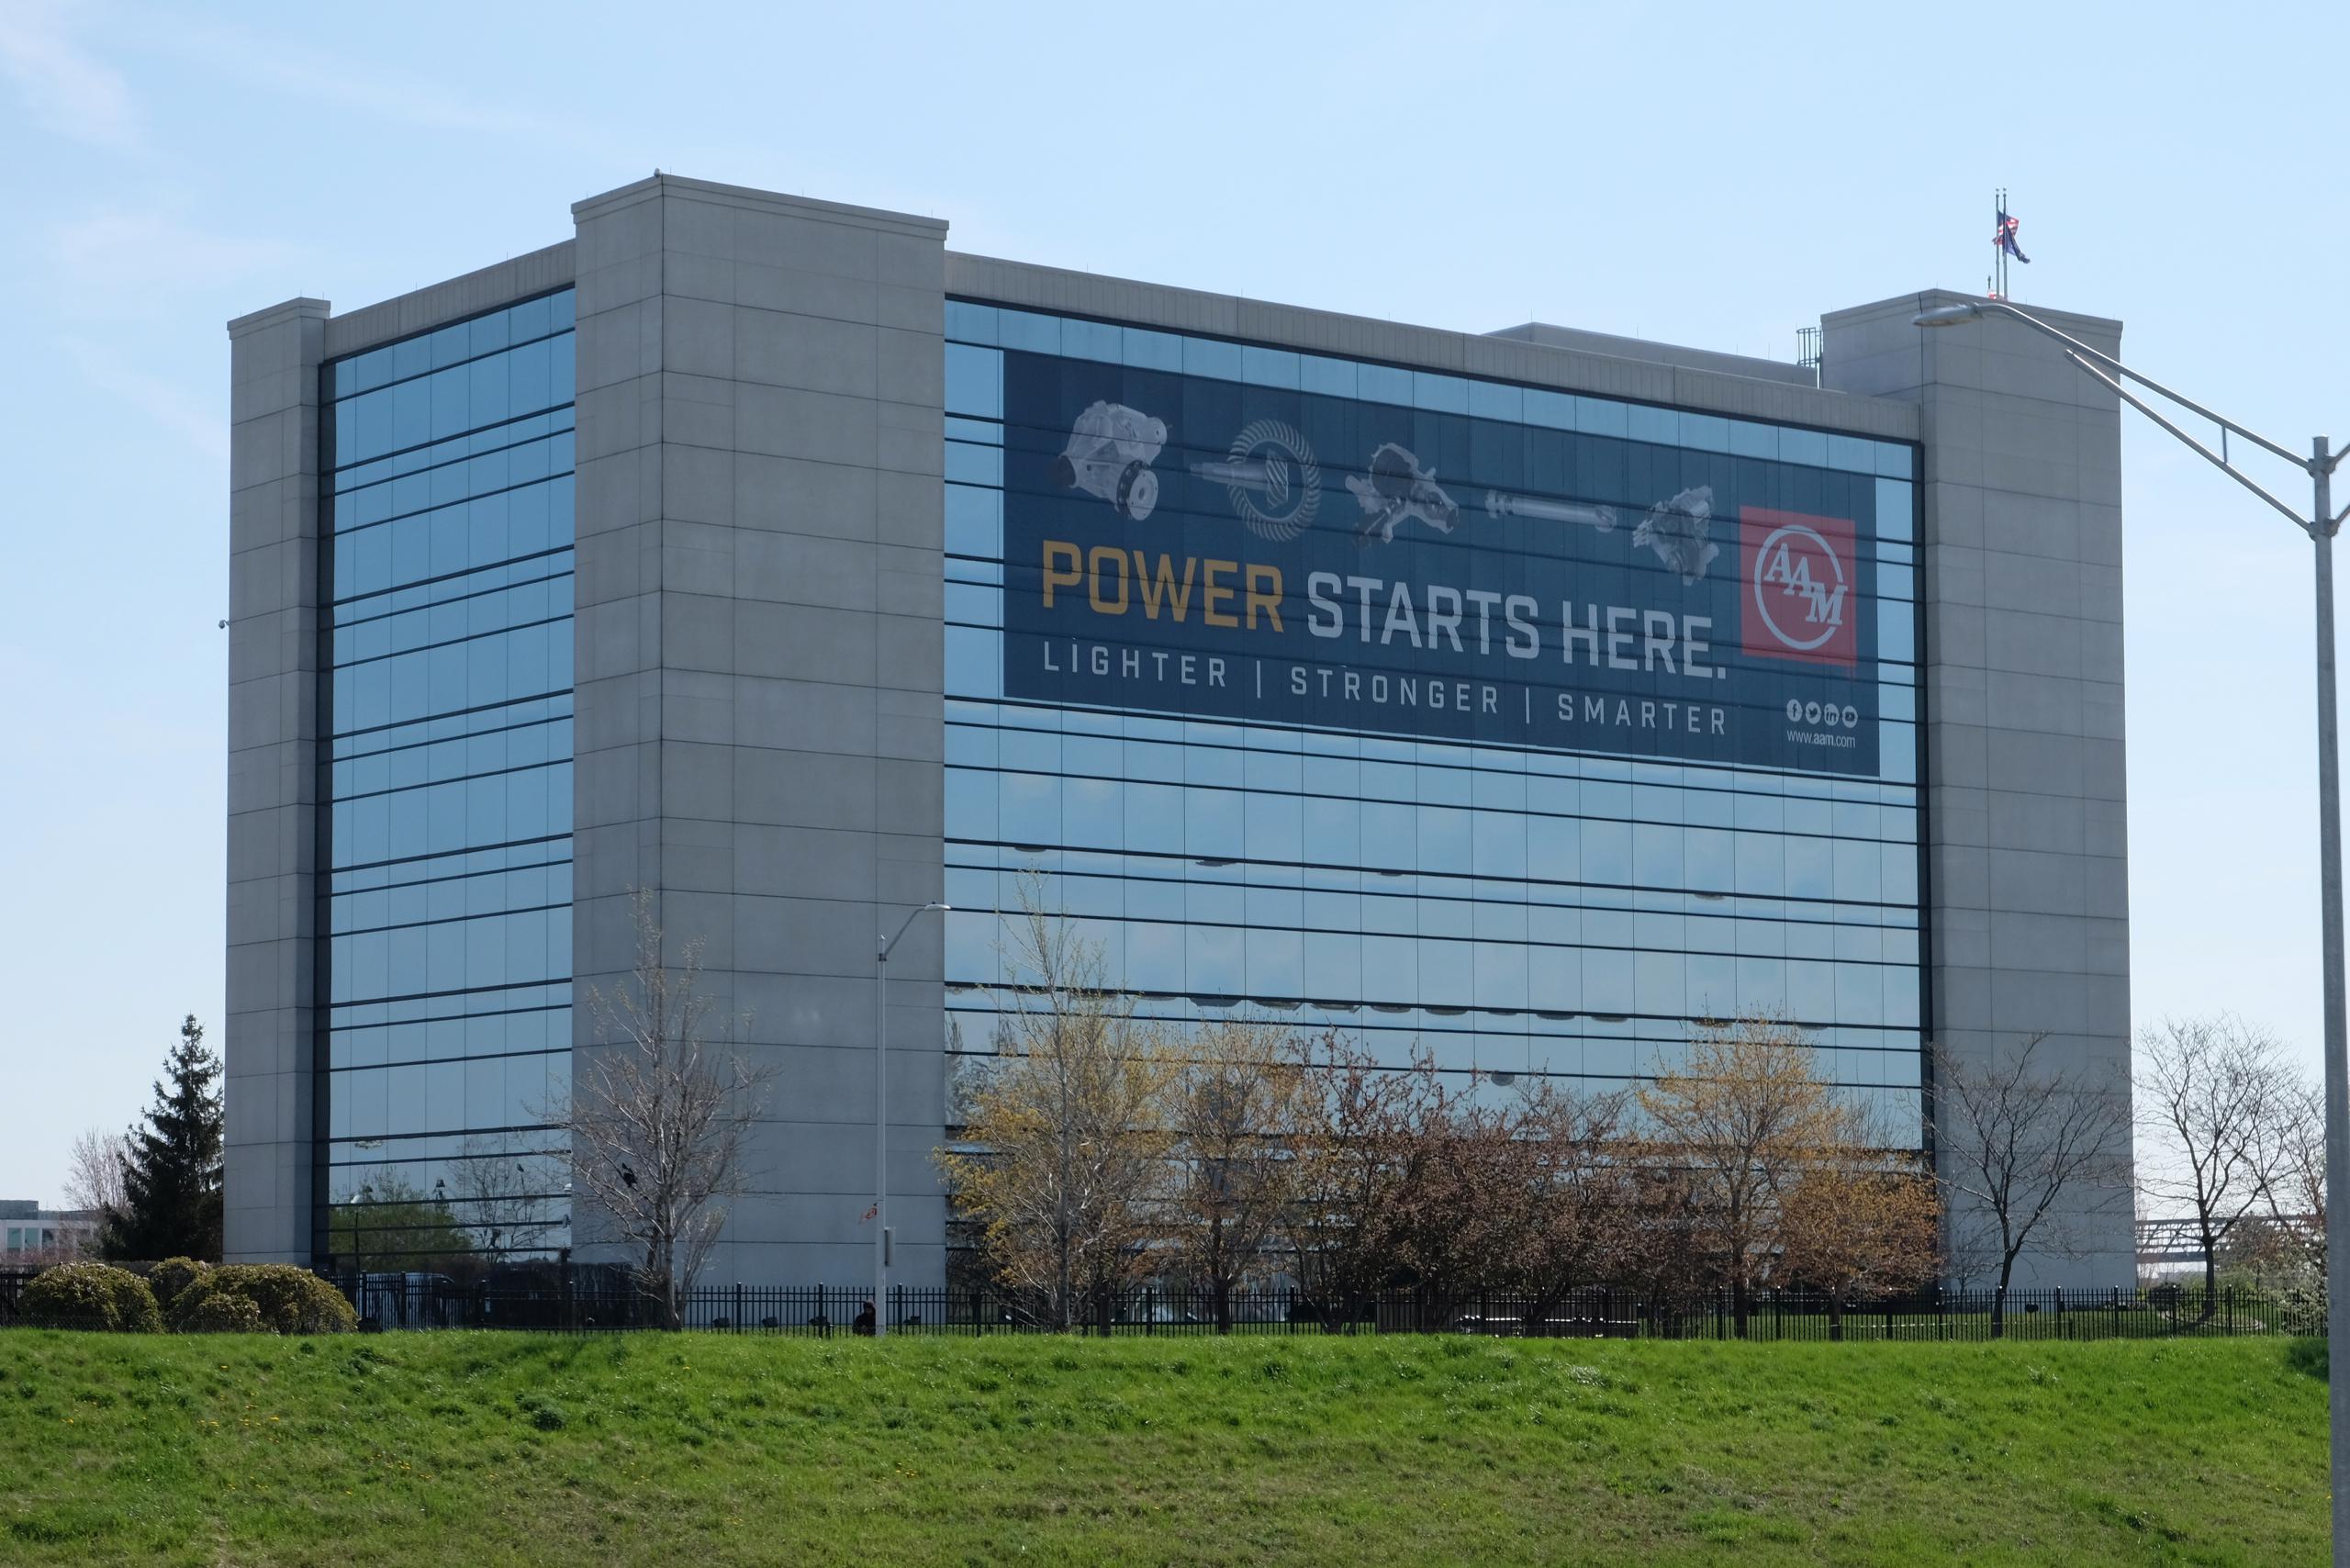 American Axle & Manufacturing's corporate headquarters in Detroit, Michigan.